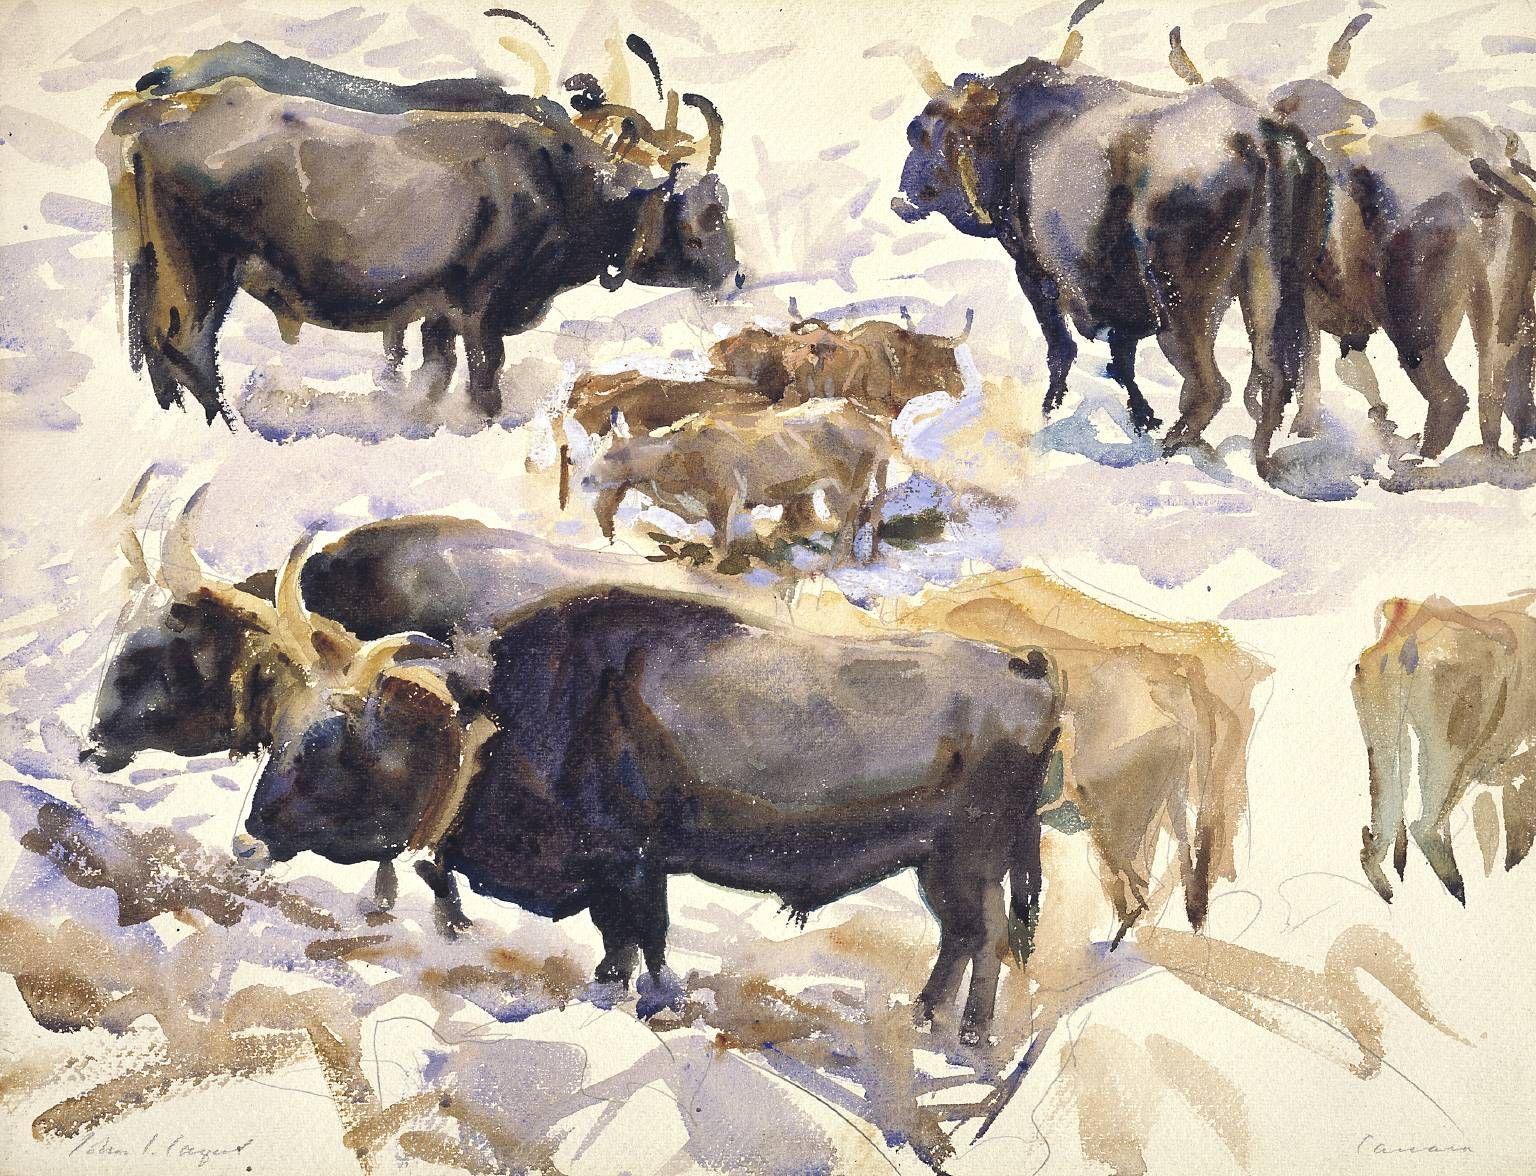 John Singer Sargent watercolor - Google Search